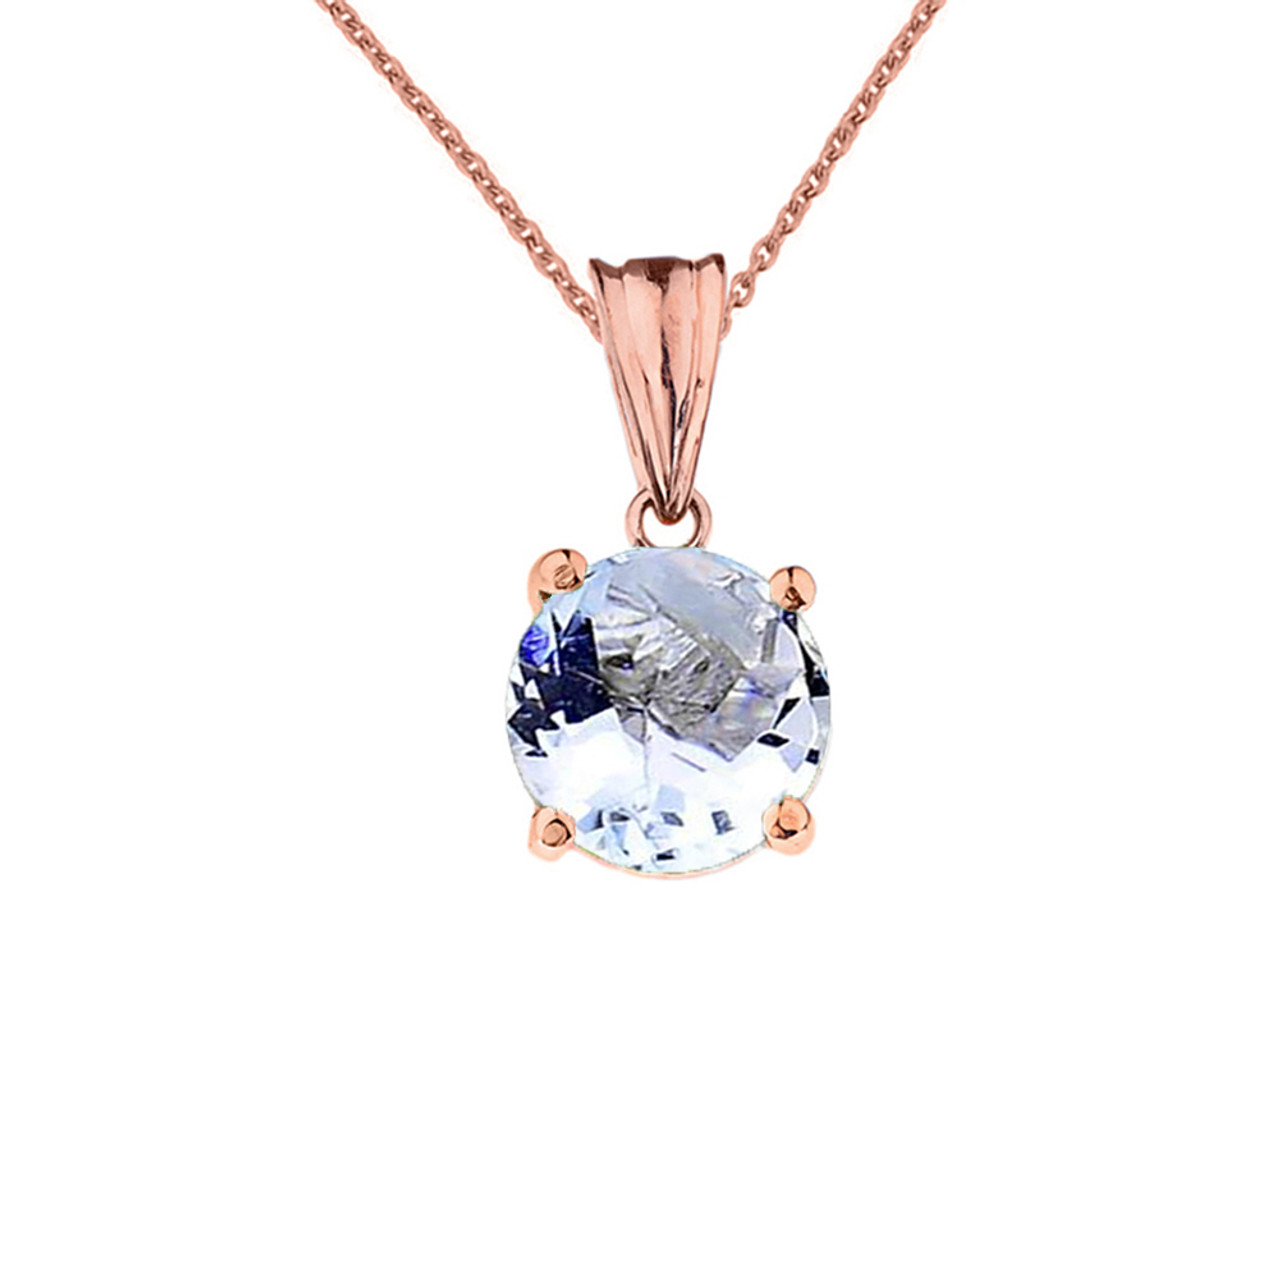 Rose gold march birthstone aquamarine lcaq birthstone pendant 10k rose gold march birthstone aquamarine lcaq pendant necklace aloadofball Choice Image